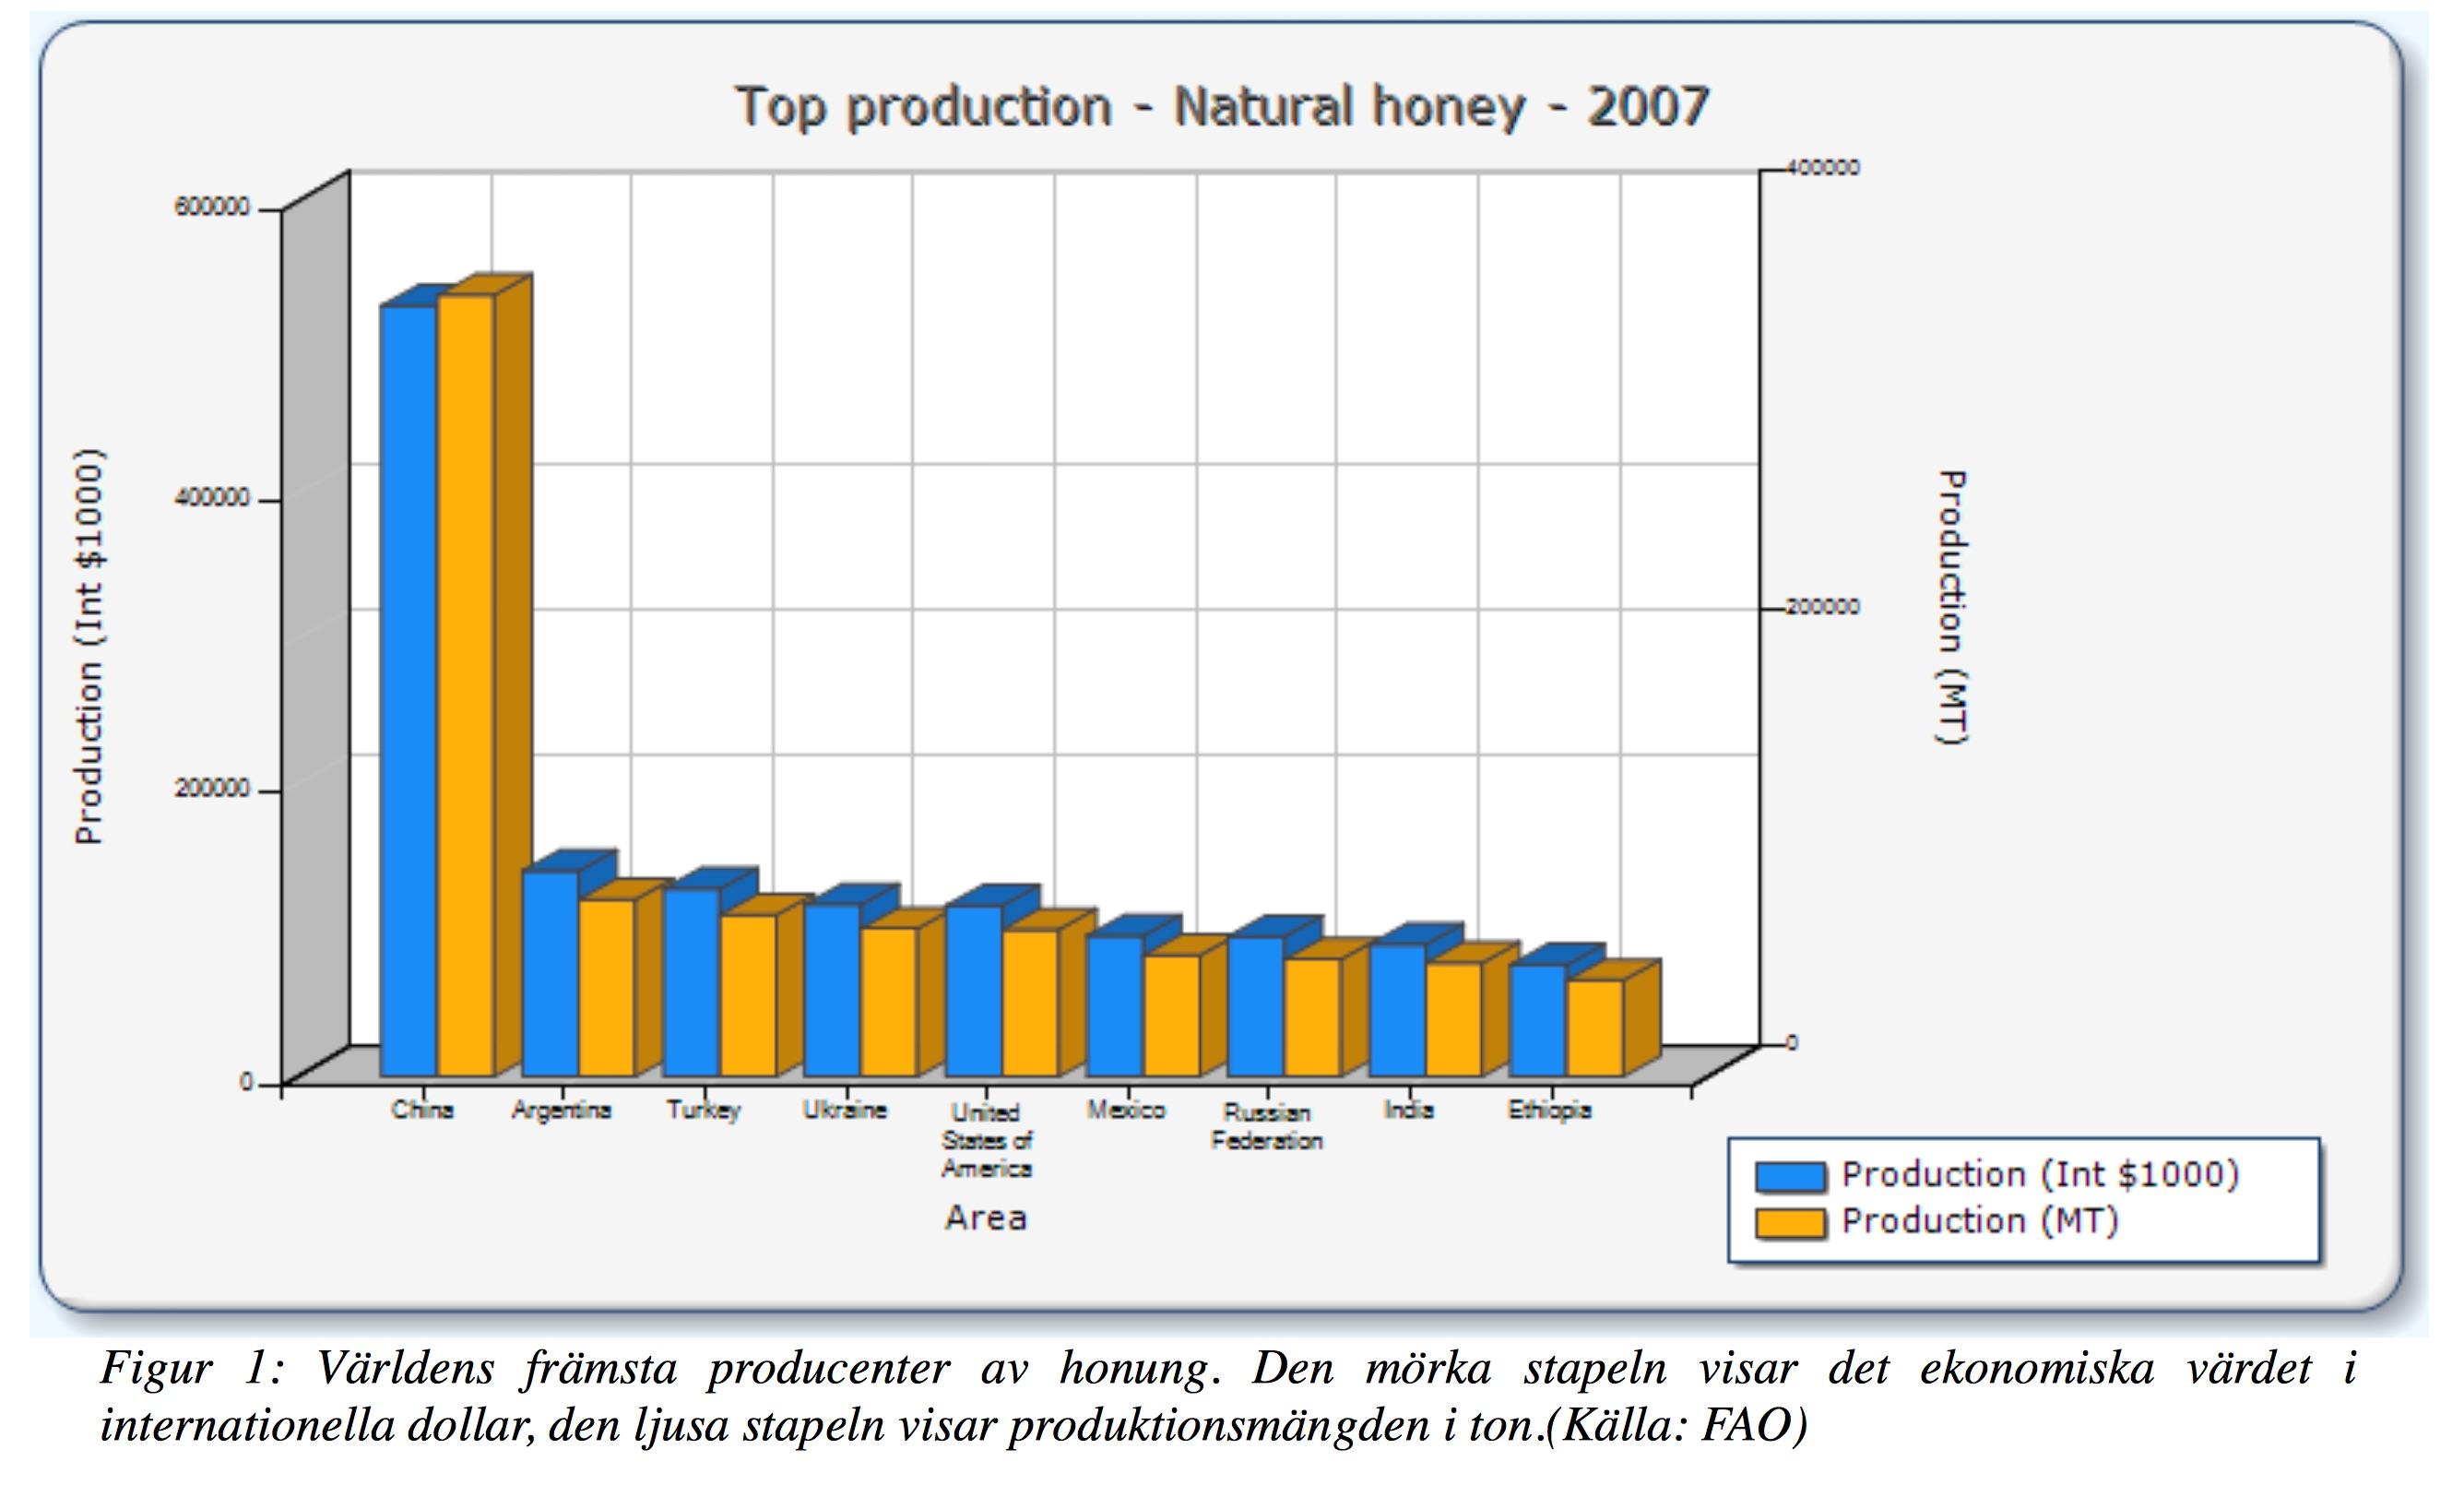 world honeyproduction2007